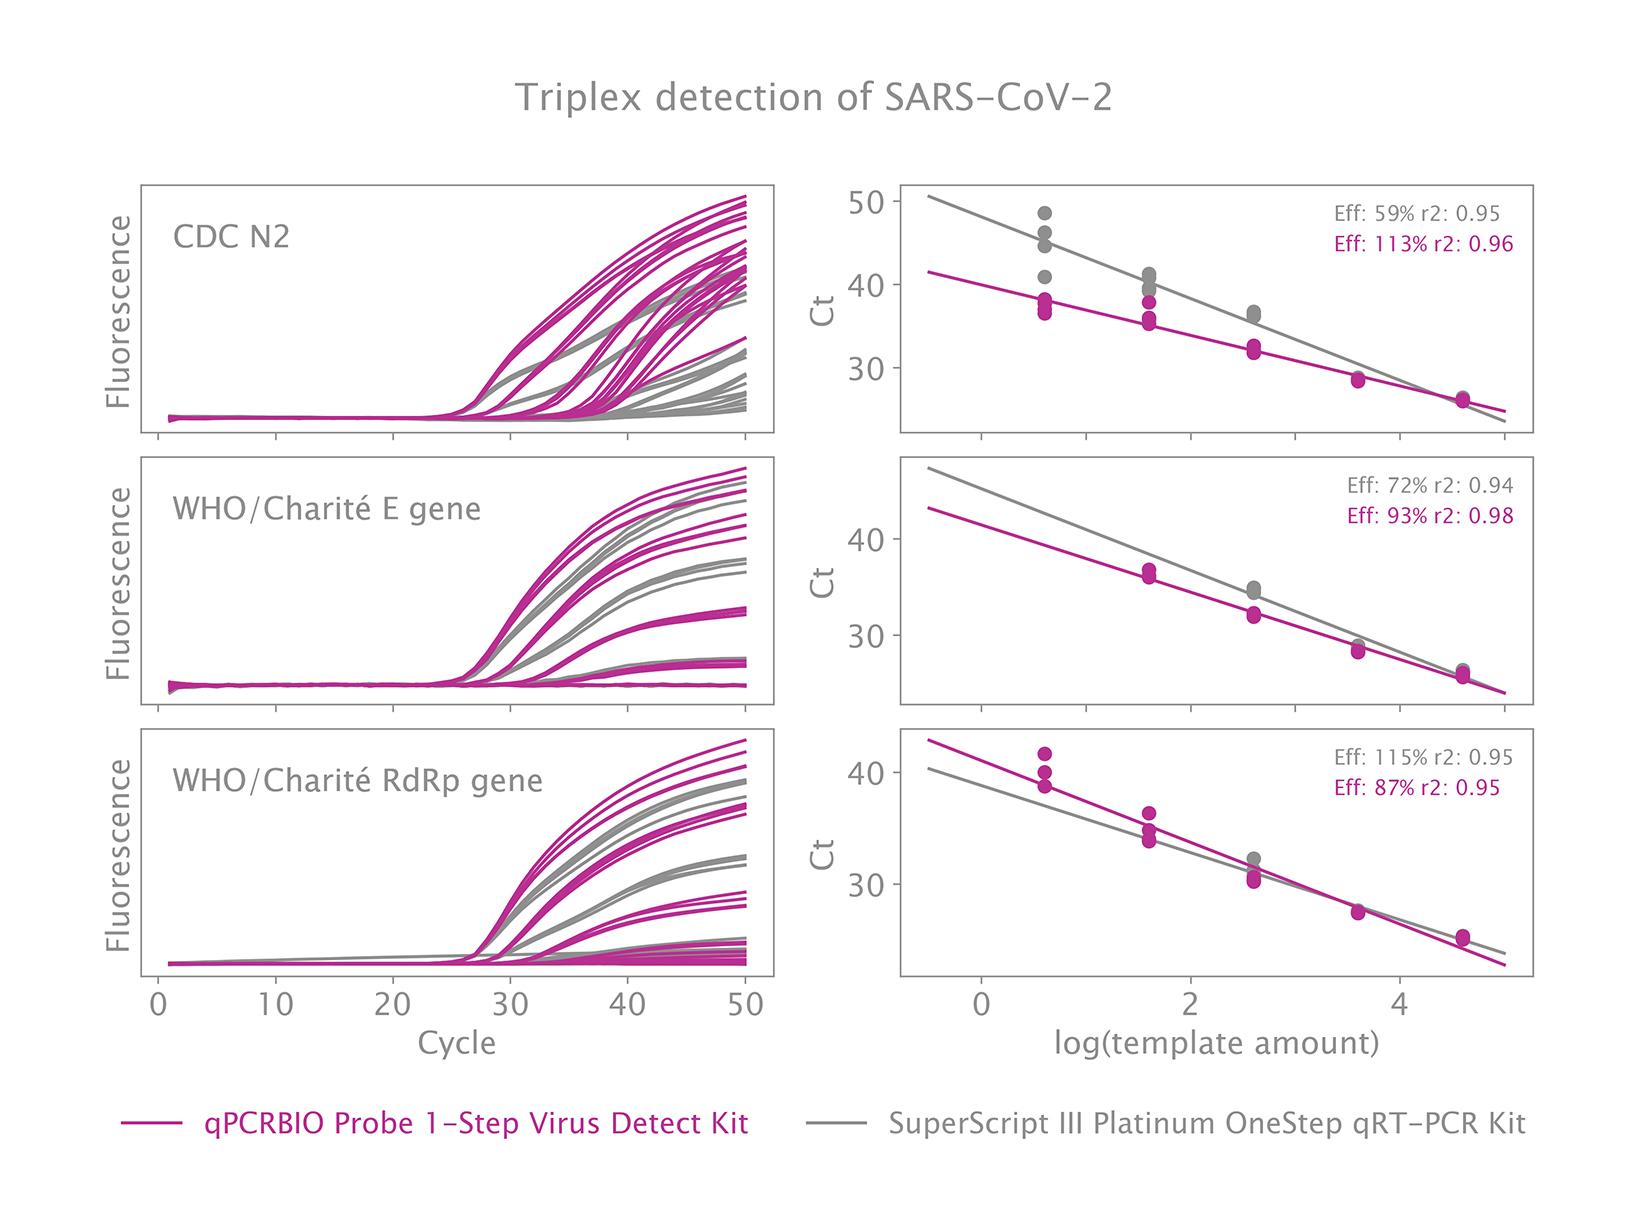 Triplex detection of SARS-CoV-2 using N2 (CDC), E (Charite) and RdRp (Charite) primer probe sequences using qPCRBIO Probe 1-Step Virus Detect